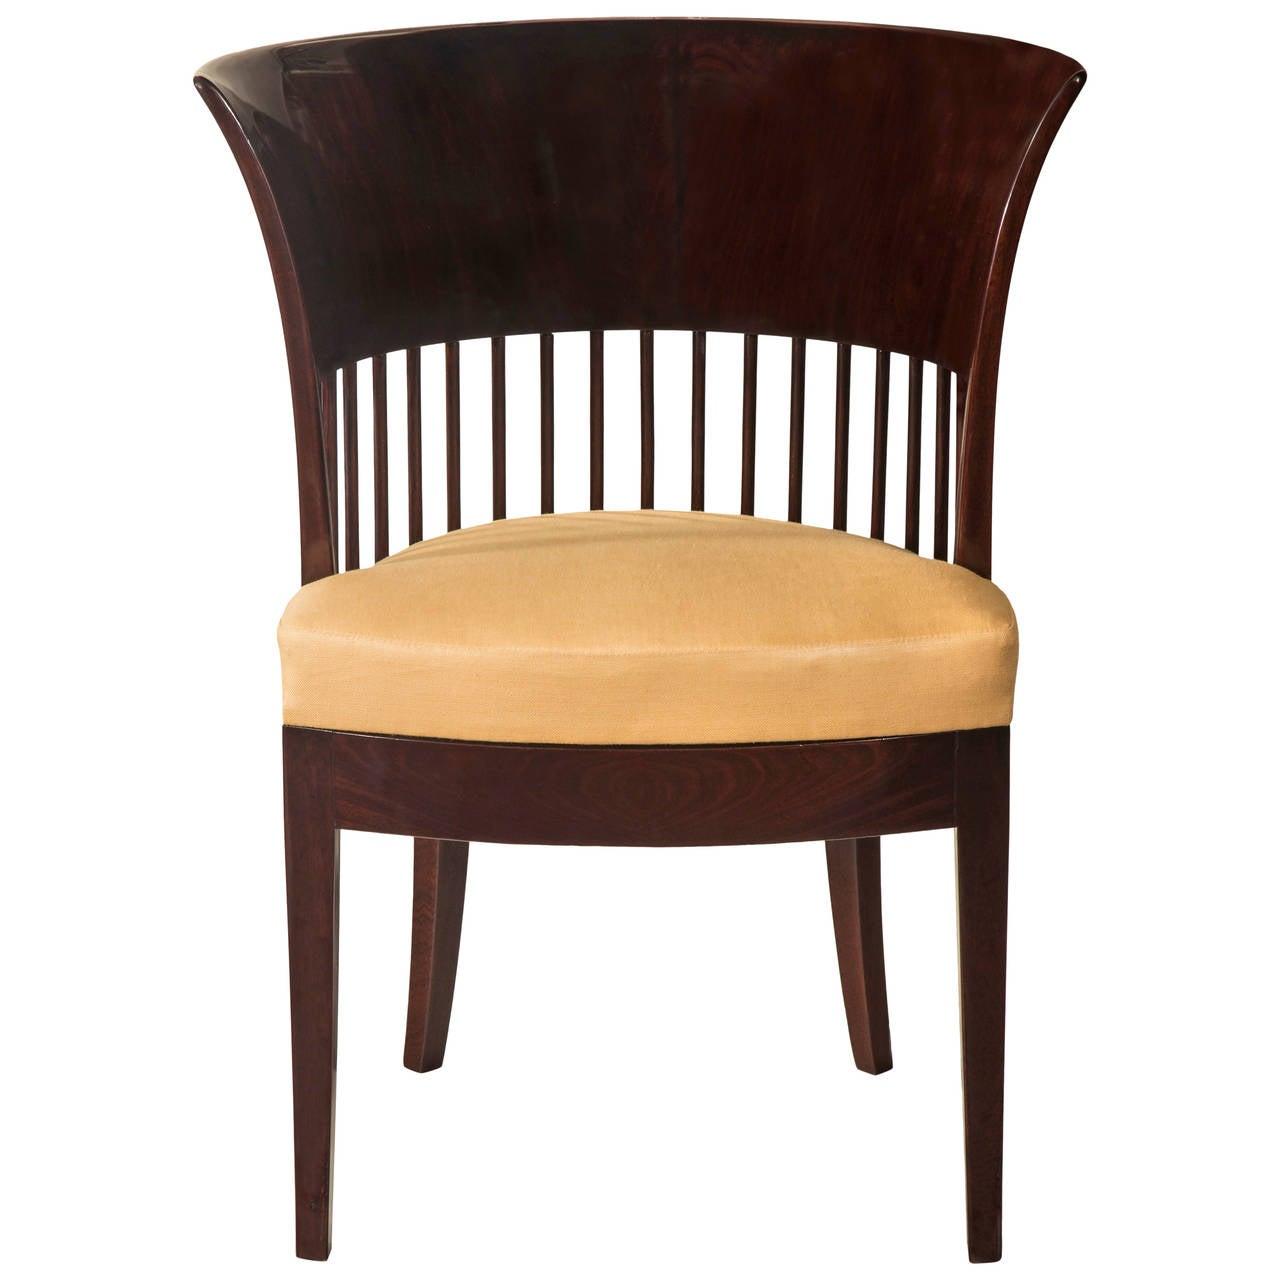 Unusual Danish Jugendstil Mahogany Chair 2